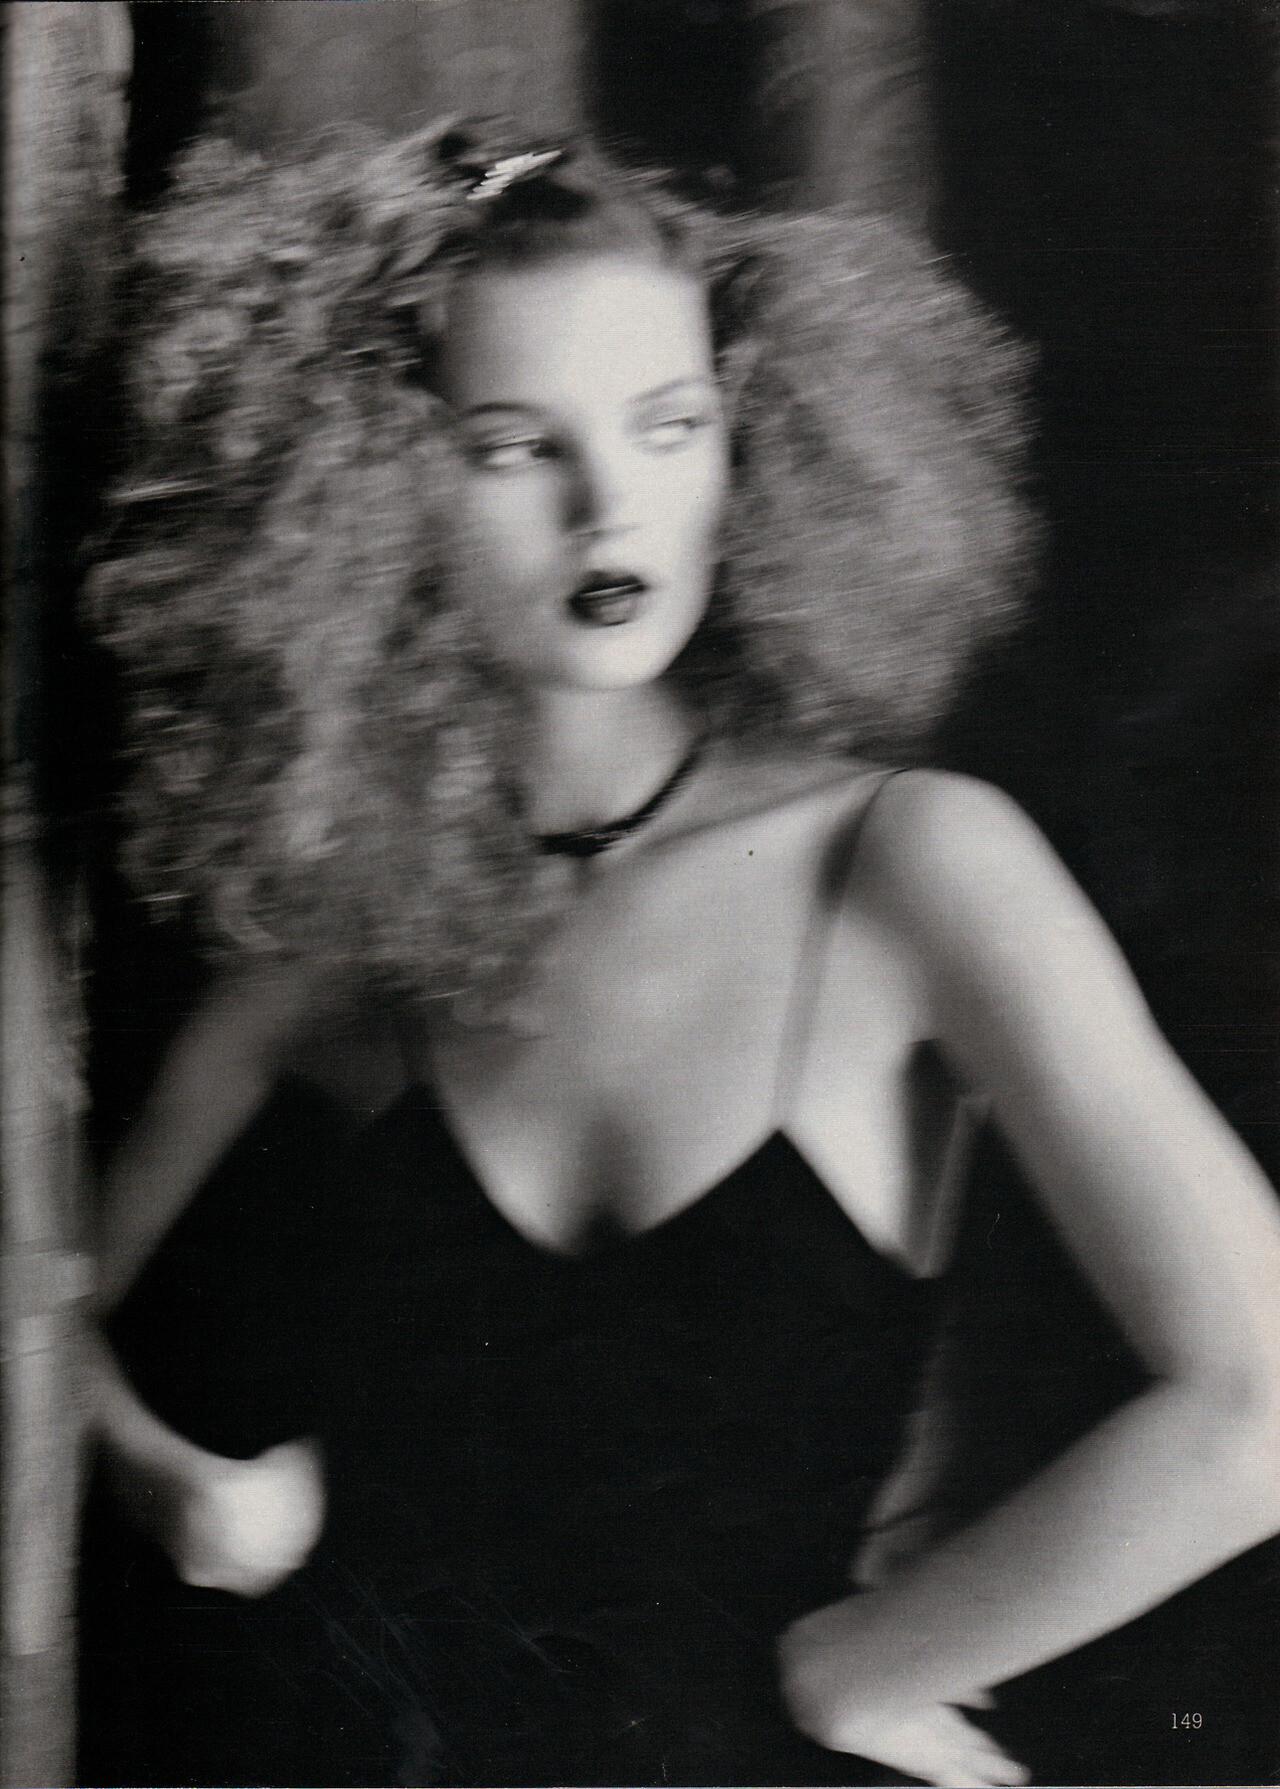 Marie Claire, Германия, август 1994 года. Фотограф Юрген Теллер